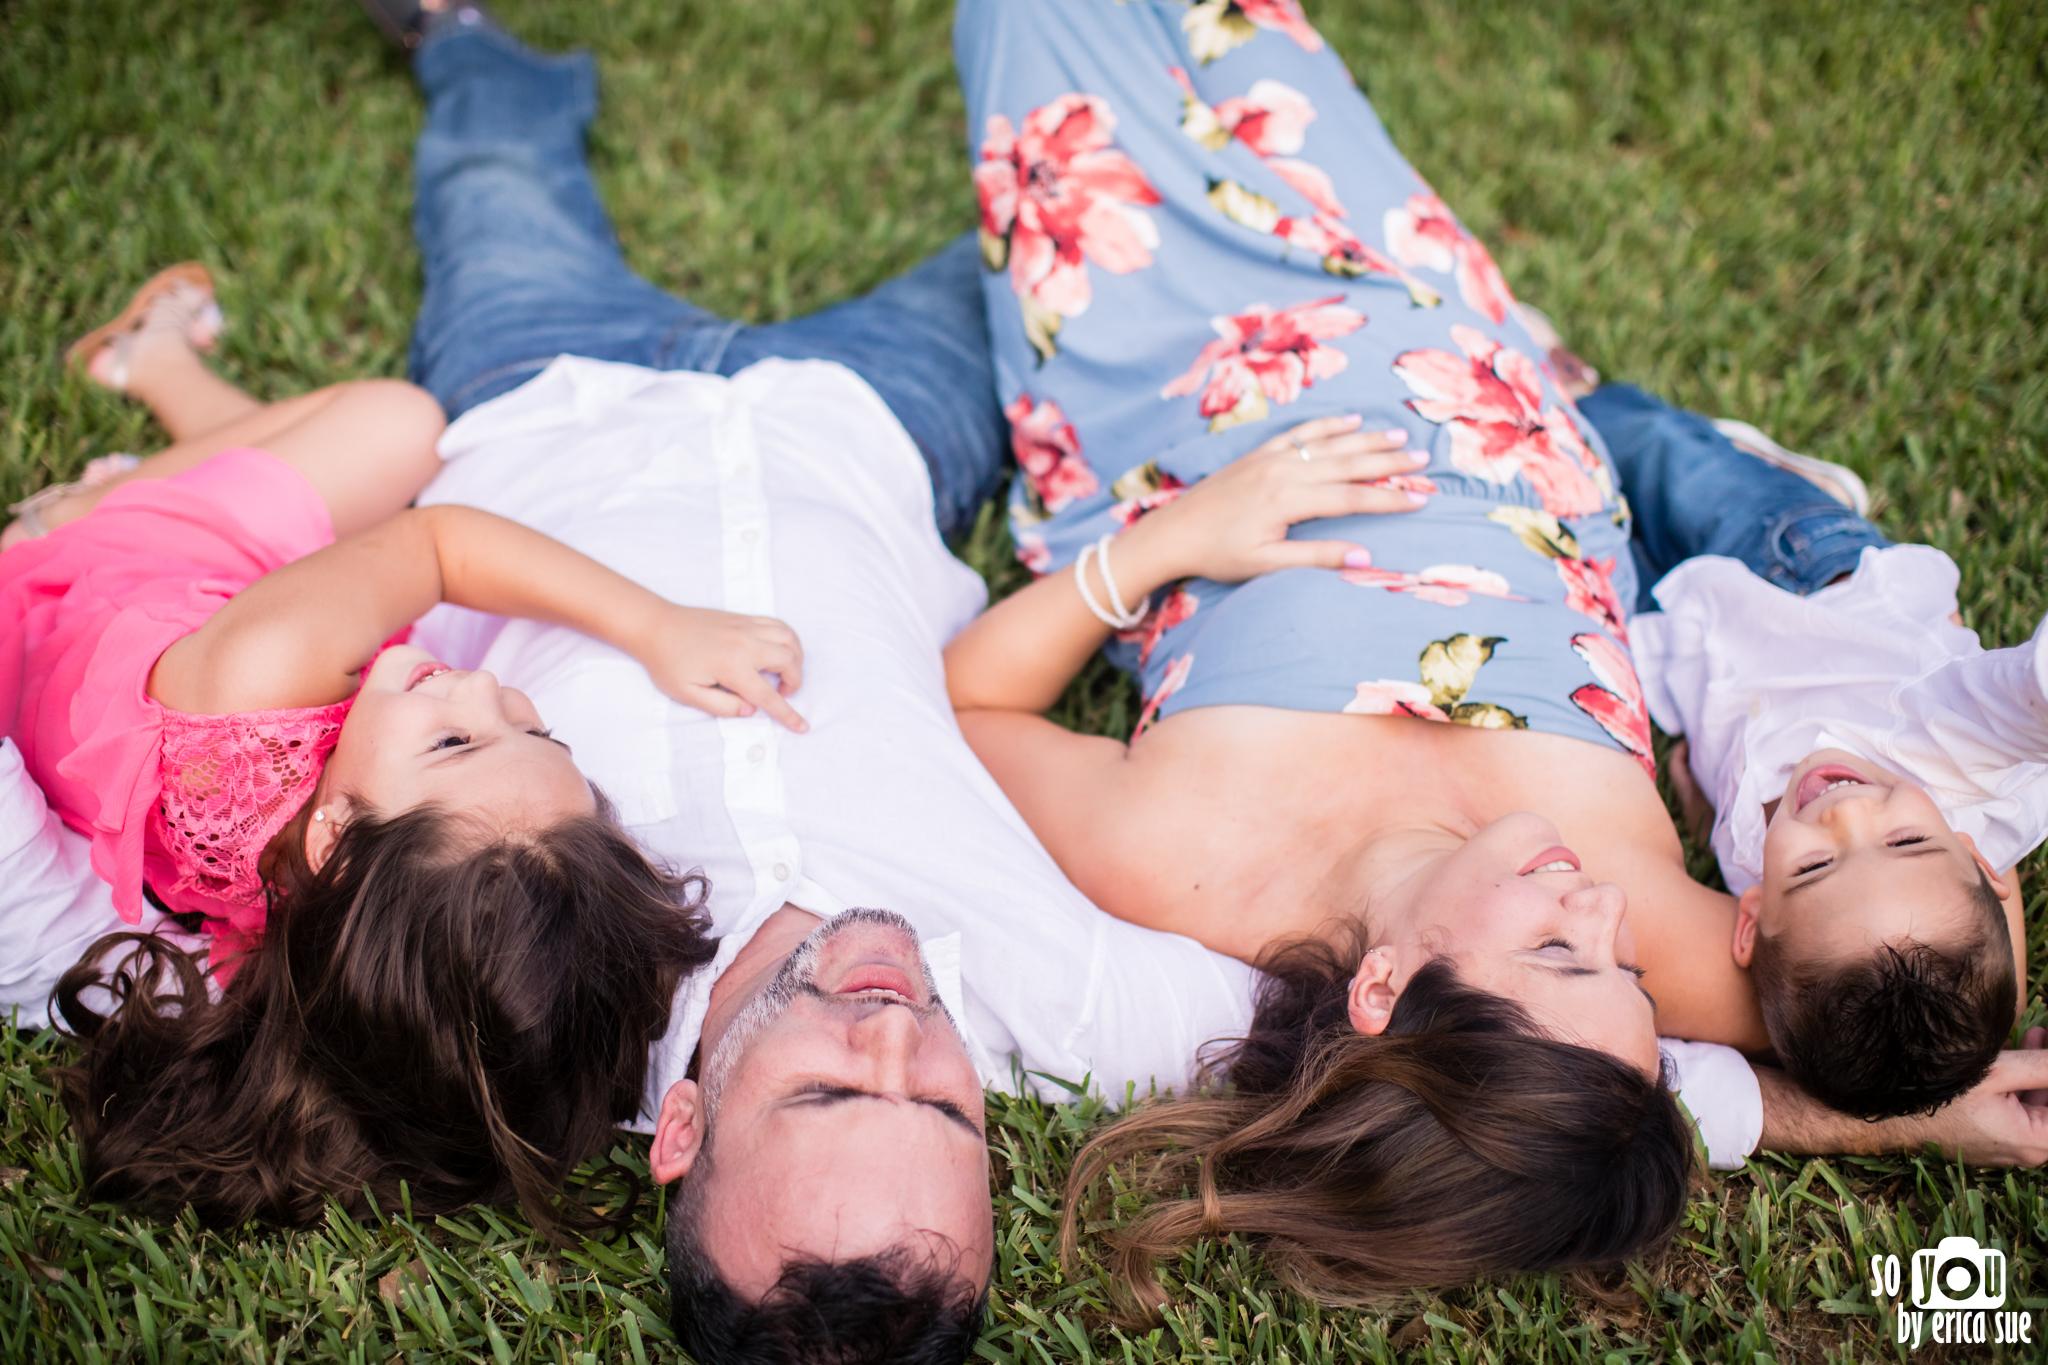 so-you-by-erica-sue-davie-maternity-photographer-fl-6985.jpg